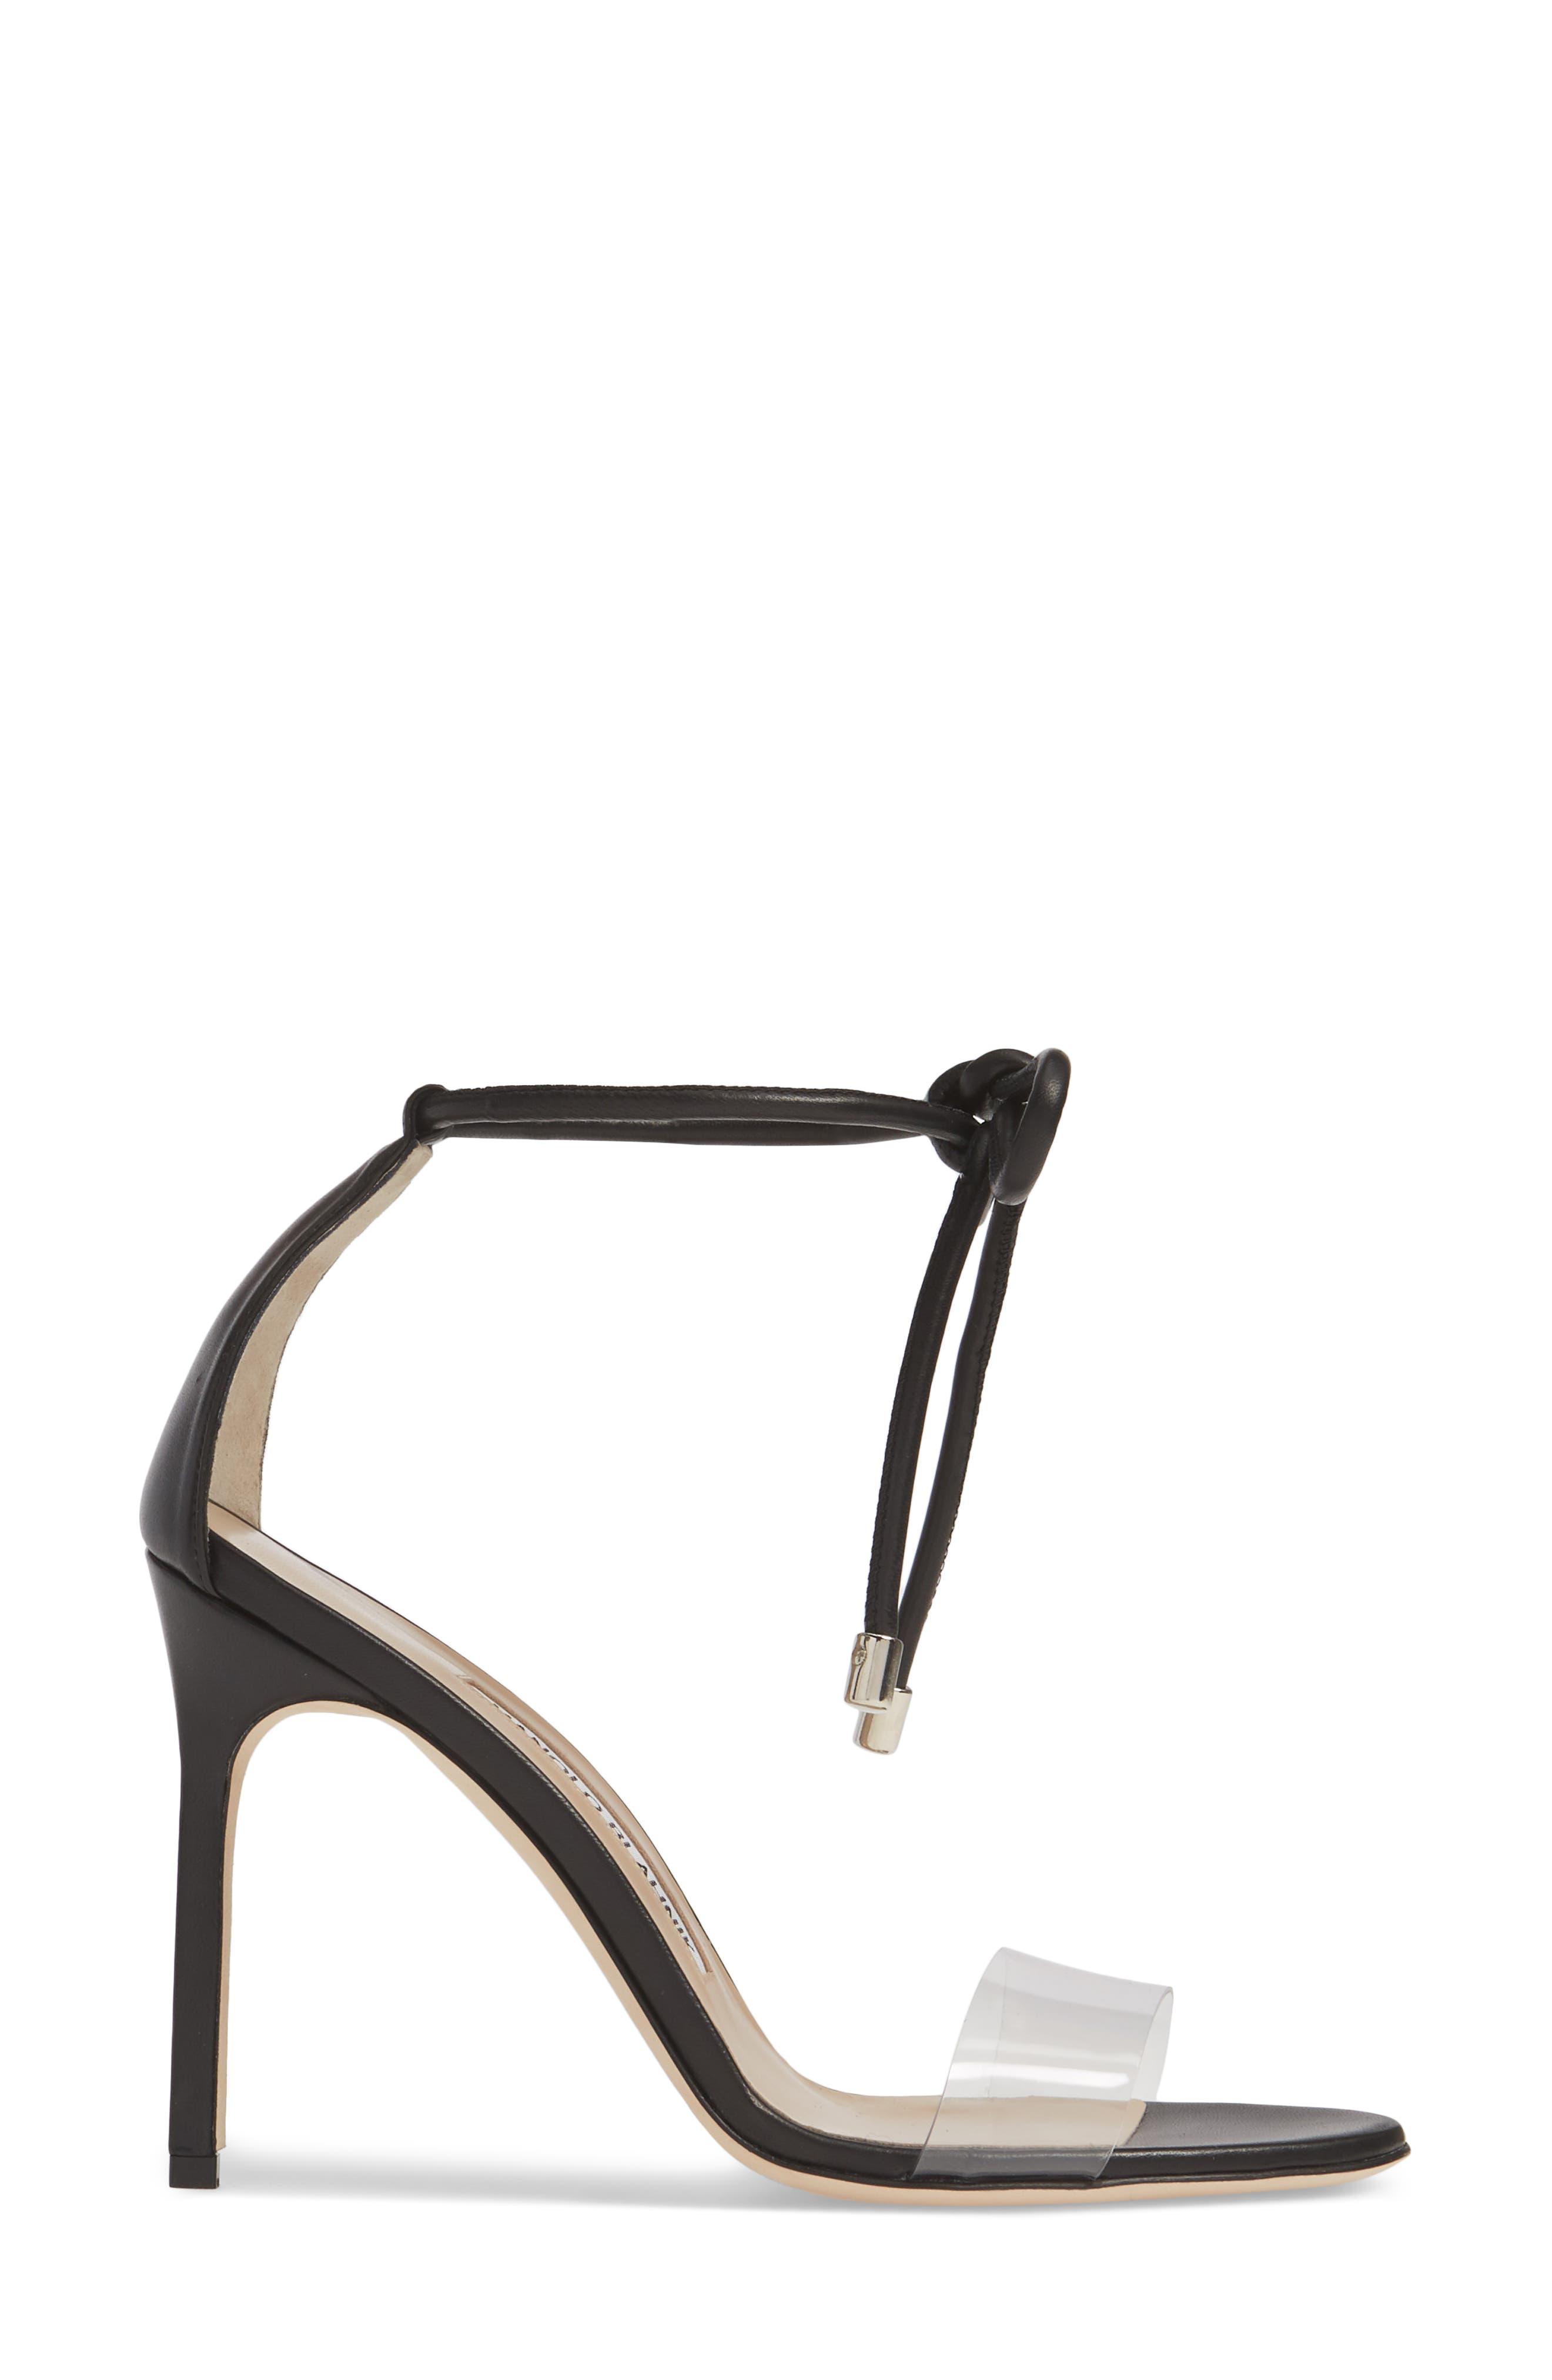 MANOLO BLAHNIK, Estro Ankle Tie Sandal, Alternate thumbnail 3, color, BLACK LEATHER